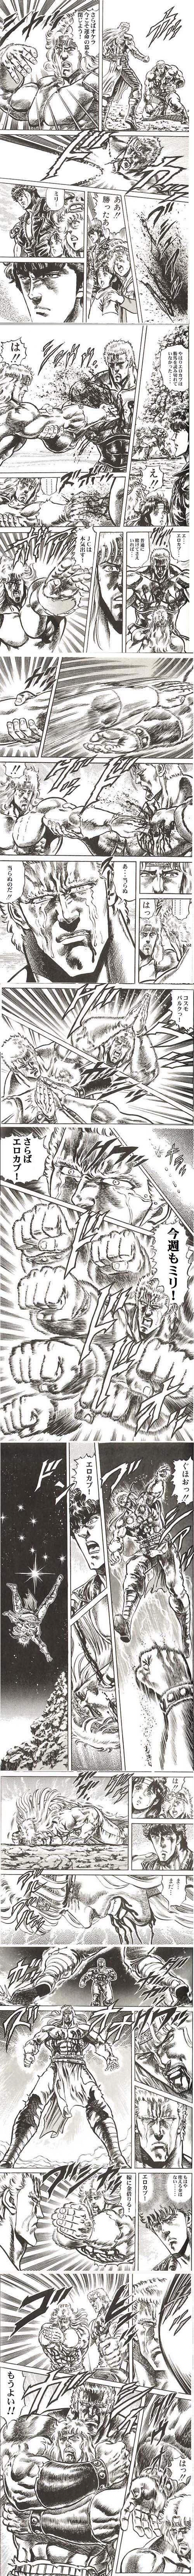 okerano_ken.JPG